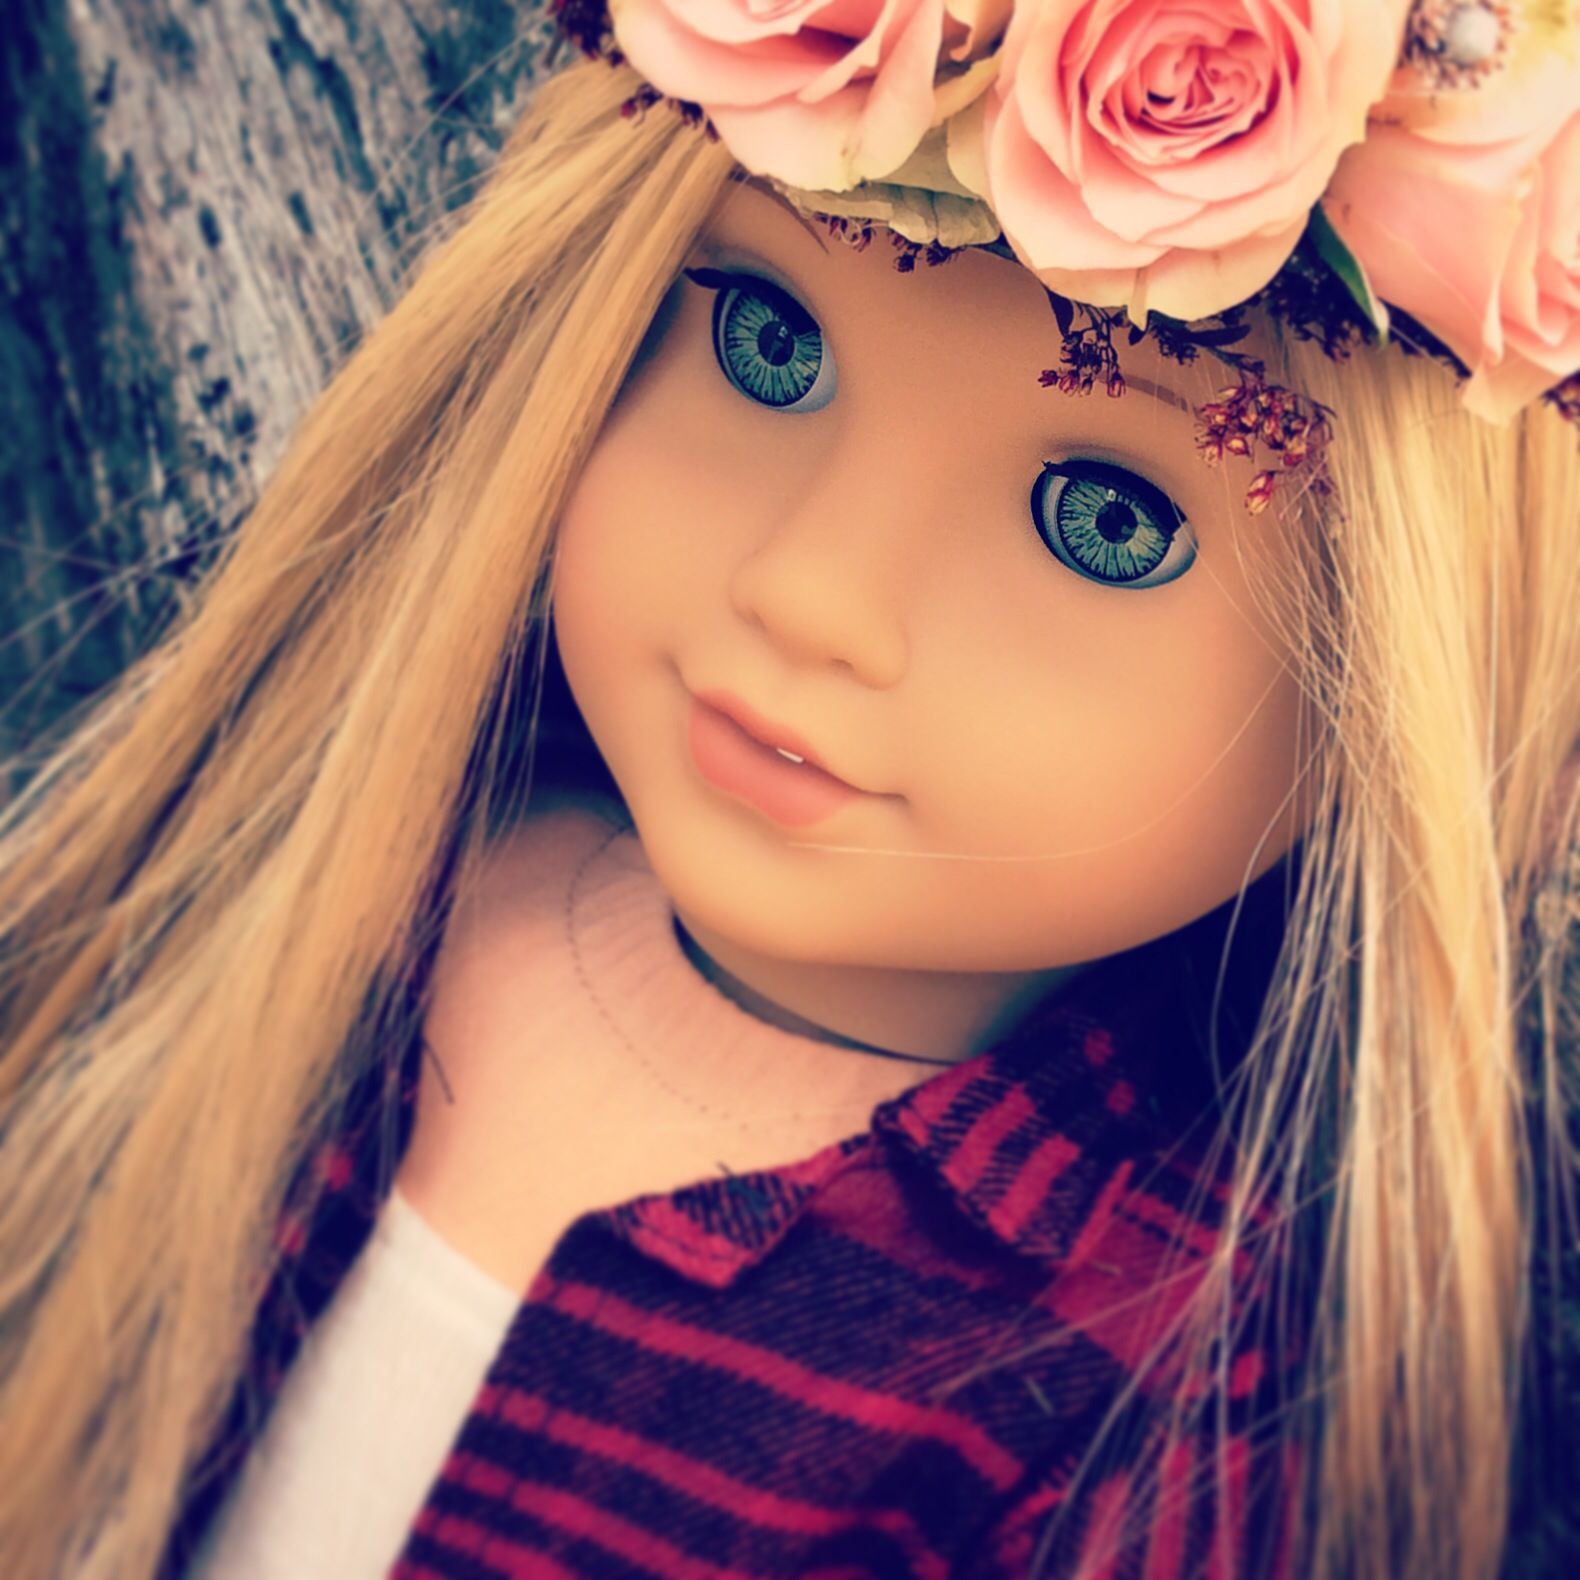 Custom Beforever Julie american girl doll Lily by fleur18studio